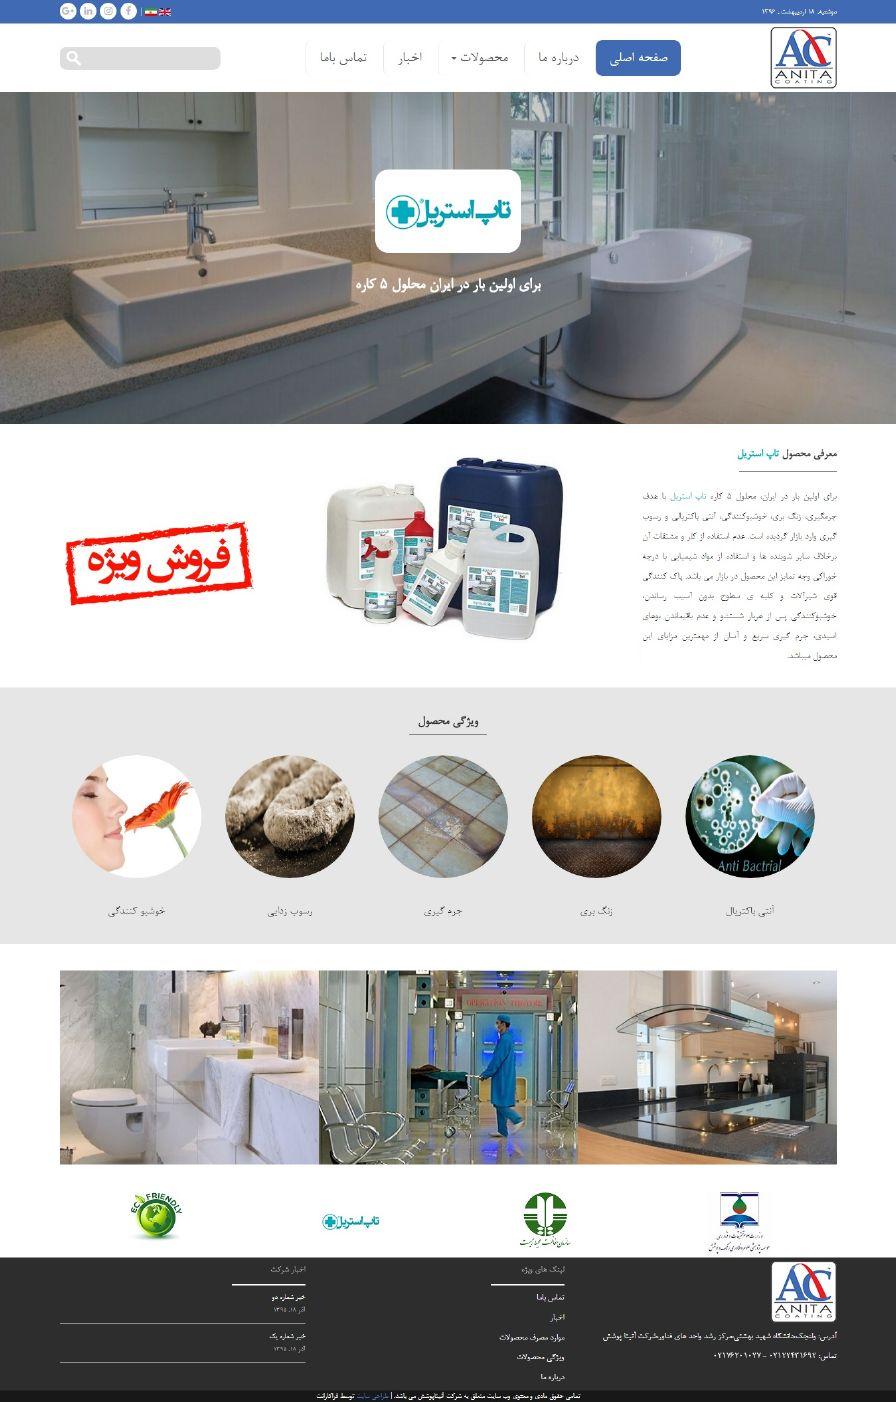 طراحی سایت شرکت آنیتا پوشش